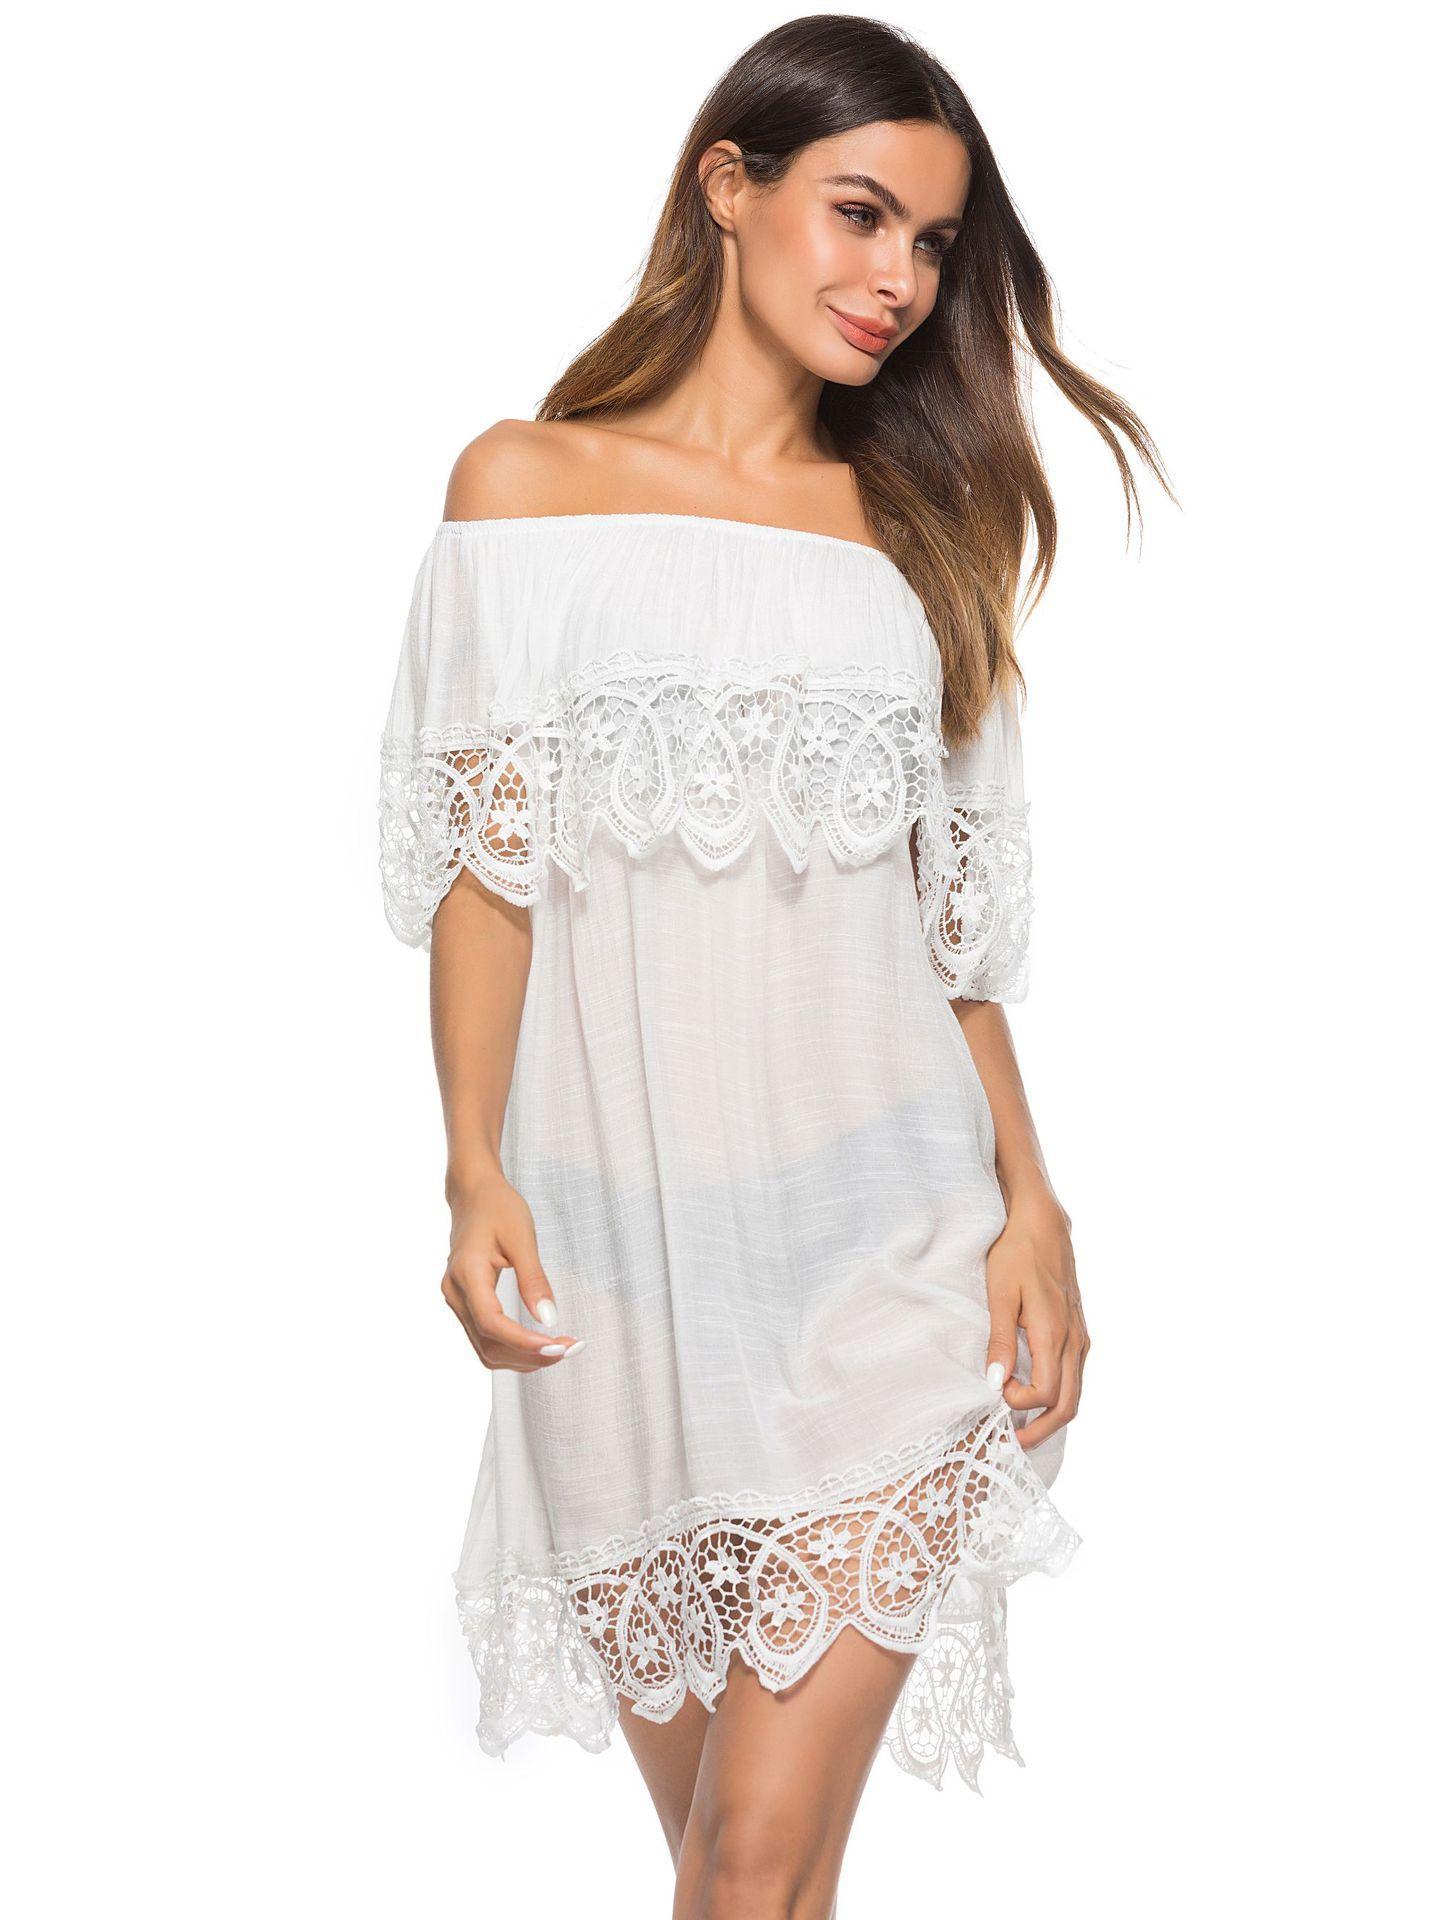 3e1c29b20b9 2019 Sarongs For Beach Cover Up Tunics Swimwear Women Dress Wear Women S Plus  Size 2018 New Lace Sexy Sunwear Skirt Animal Cotton From Wangleme0